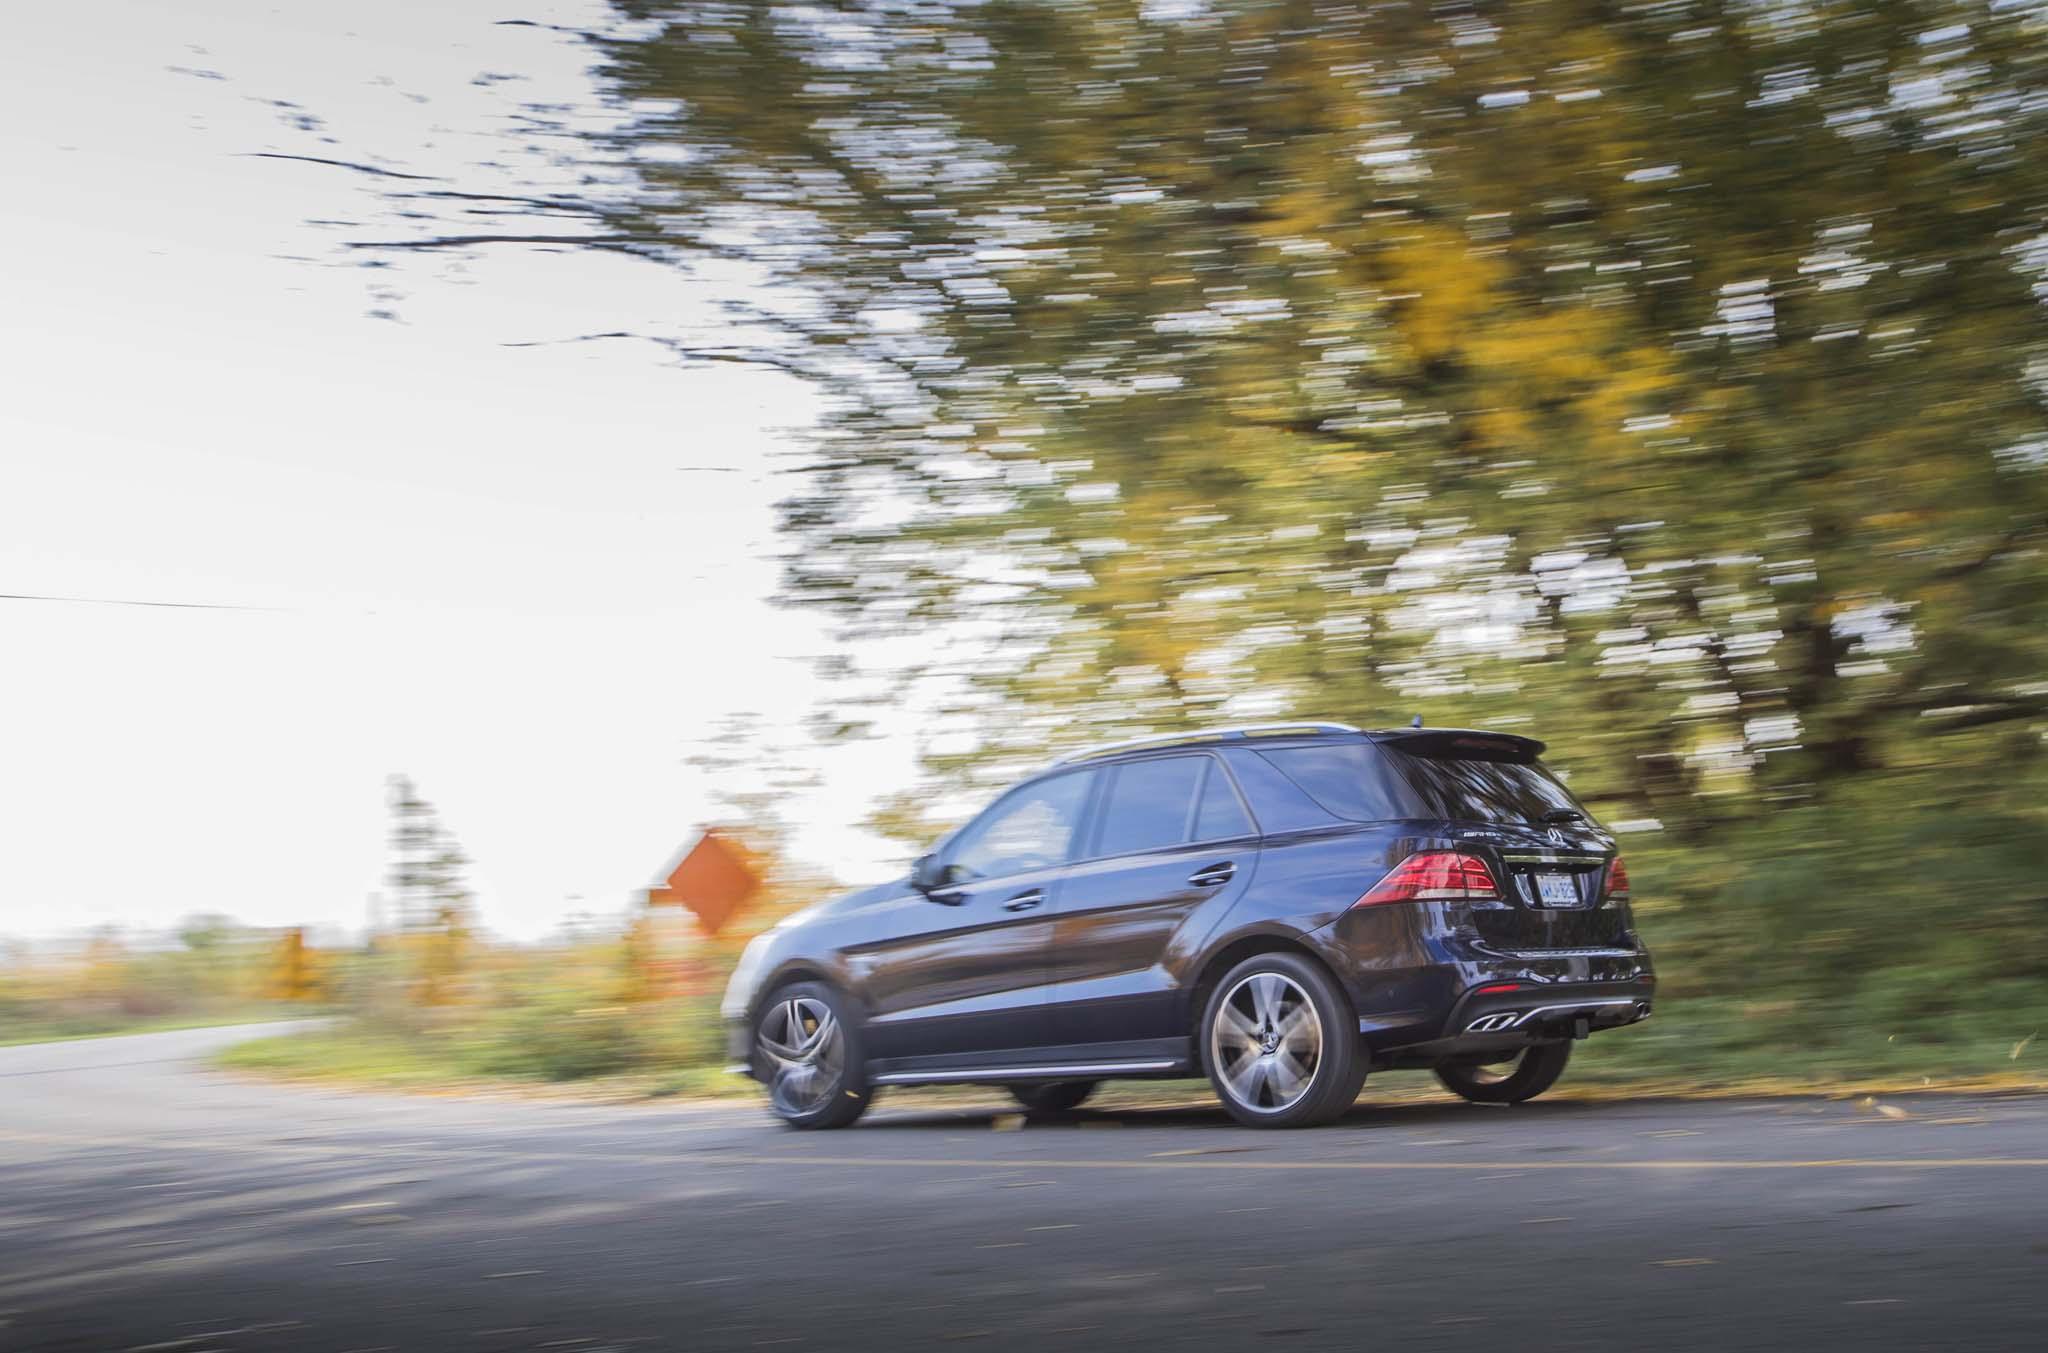 http://st.automobilemag.com/uploads/sites/10/2017/02/2017-Mercedes-AMG-GLE43-rear-three-quarter-in-motion-04.jpg